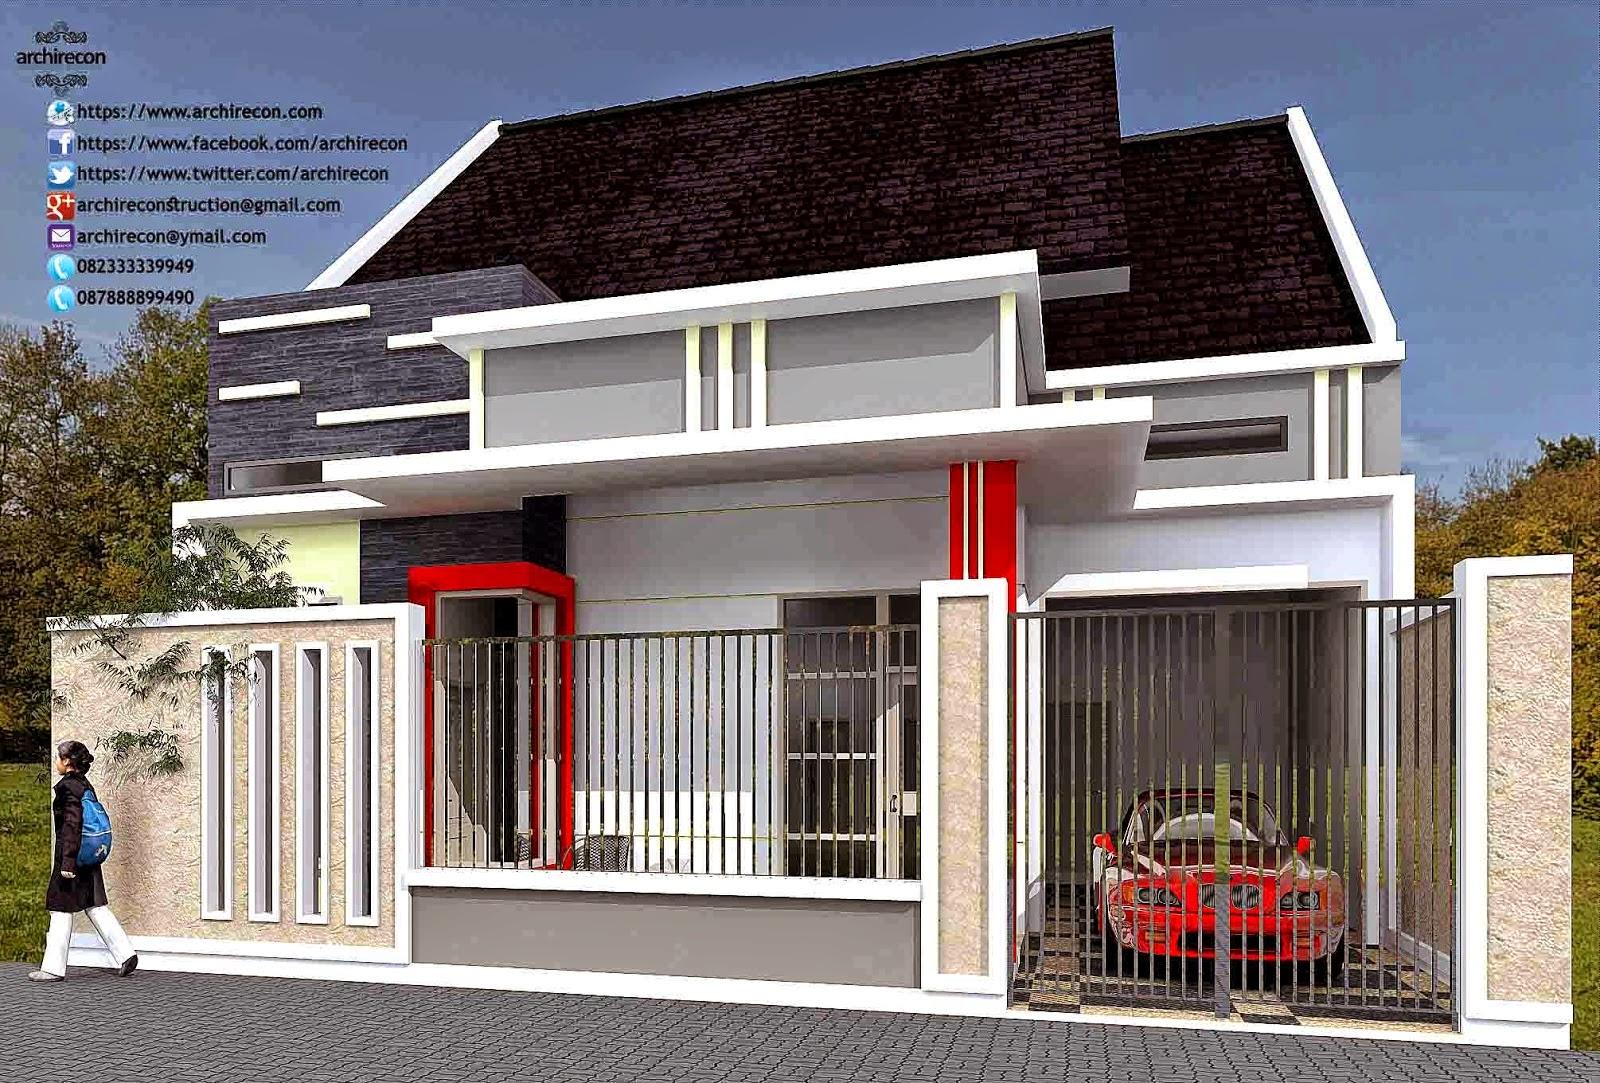 Rumah Dijual Di Bandung | 0823.3333.9949 | 0878.888.99490